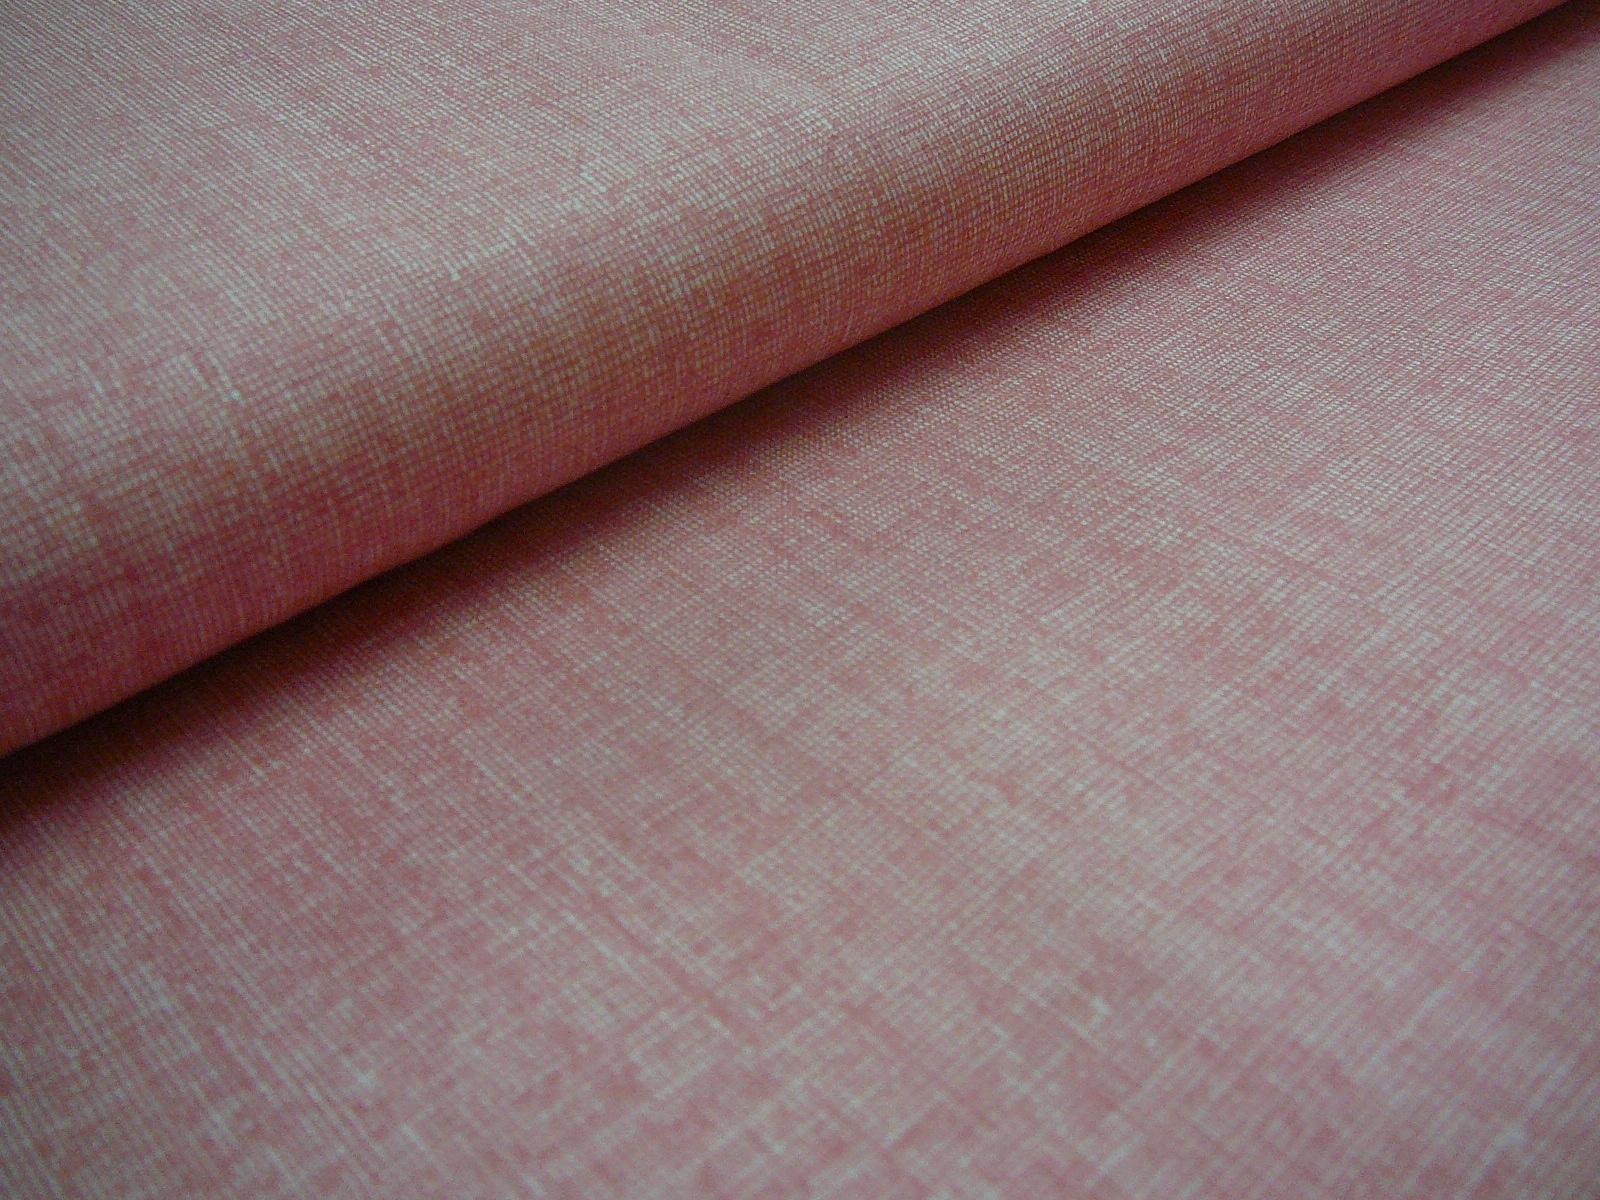 63edcb4e5740 metráž - režný efekt - růžový - šíře 140cm   Zboží prodejce látky ...